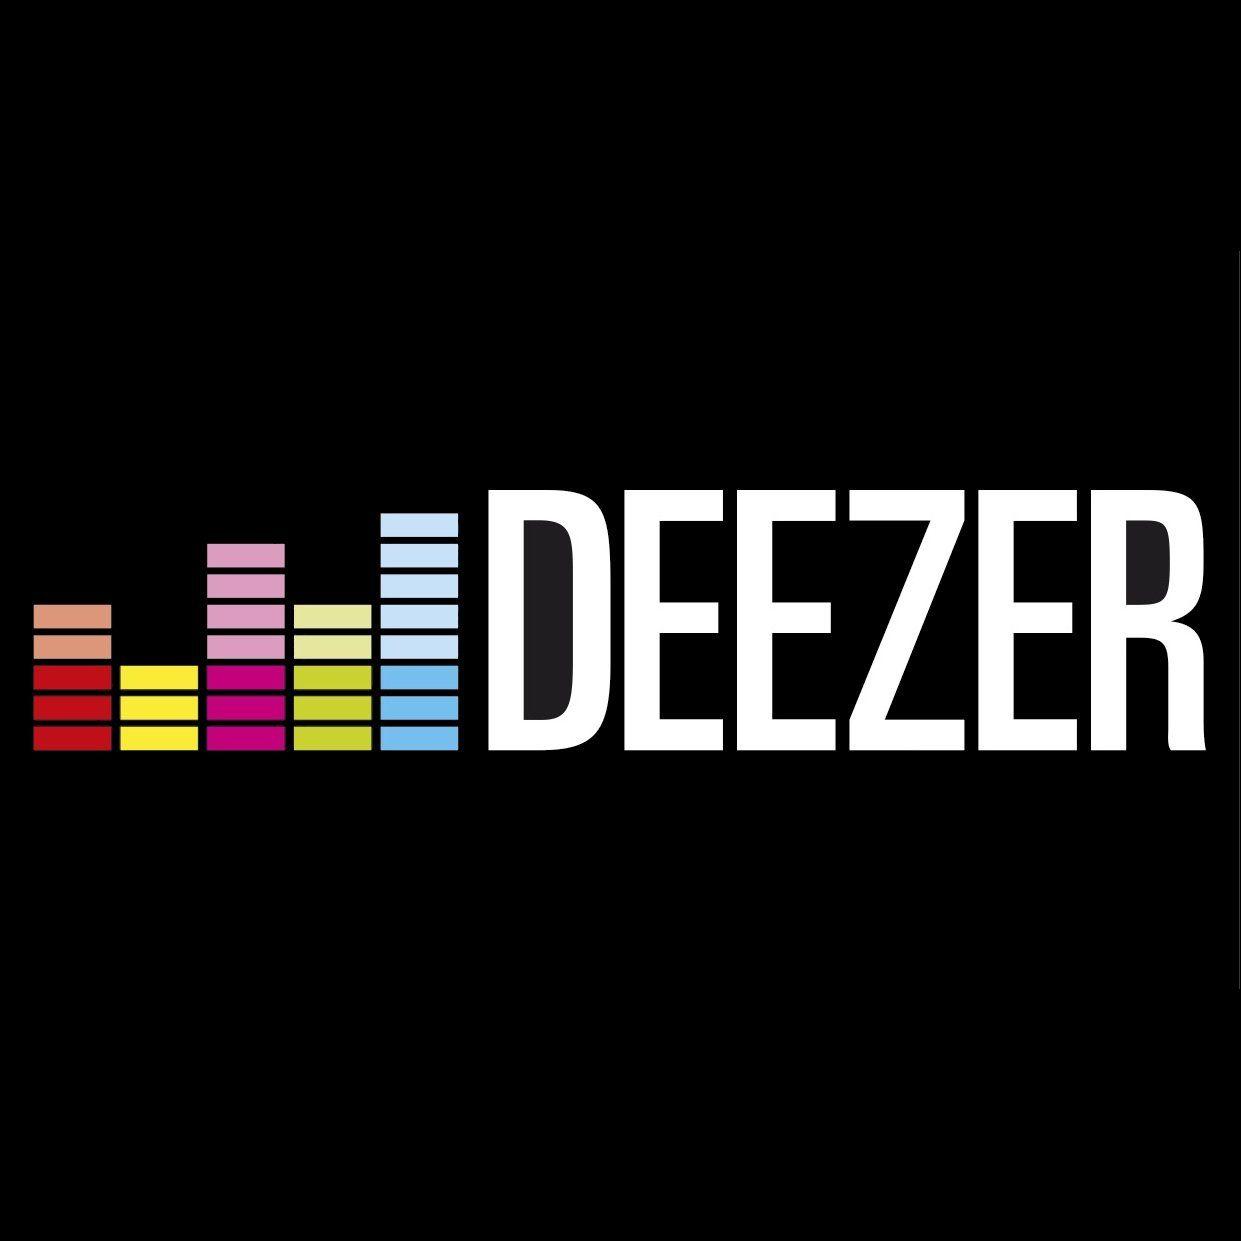 Deezer Free Accounts 2020 Premium Account And Password Accounting Passwords Download Free App